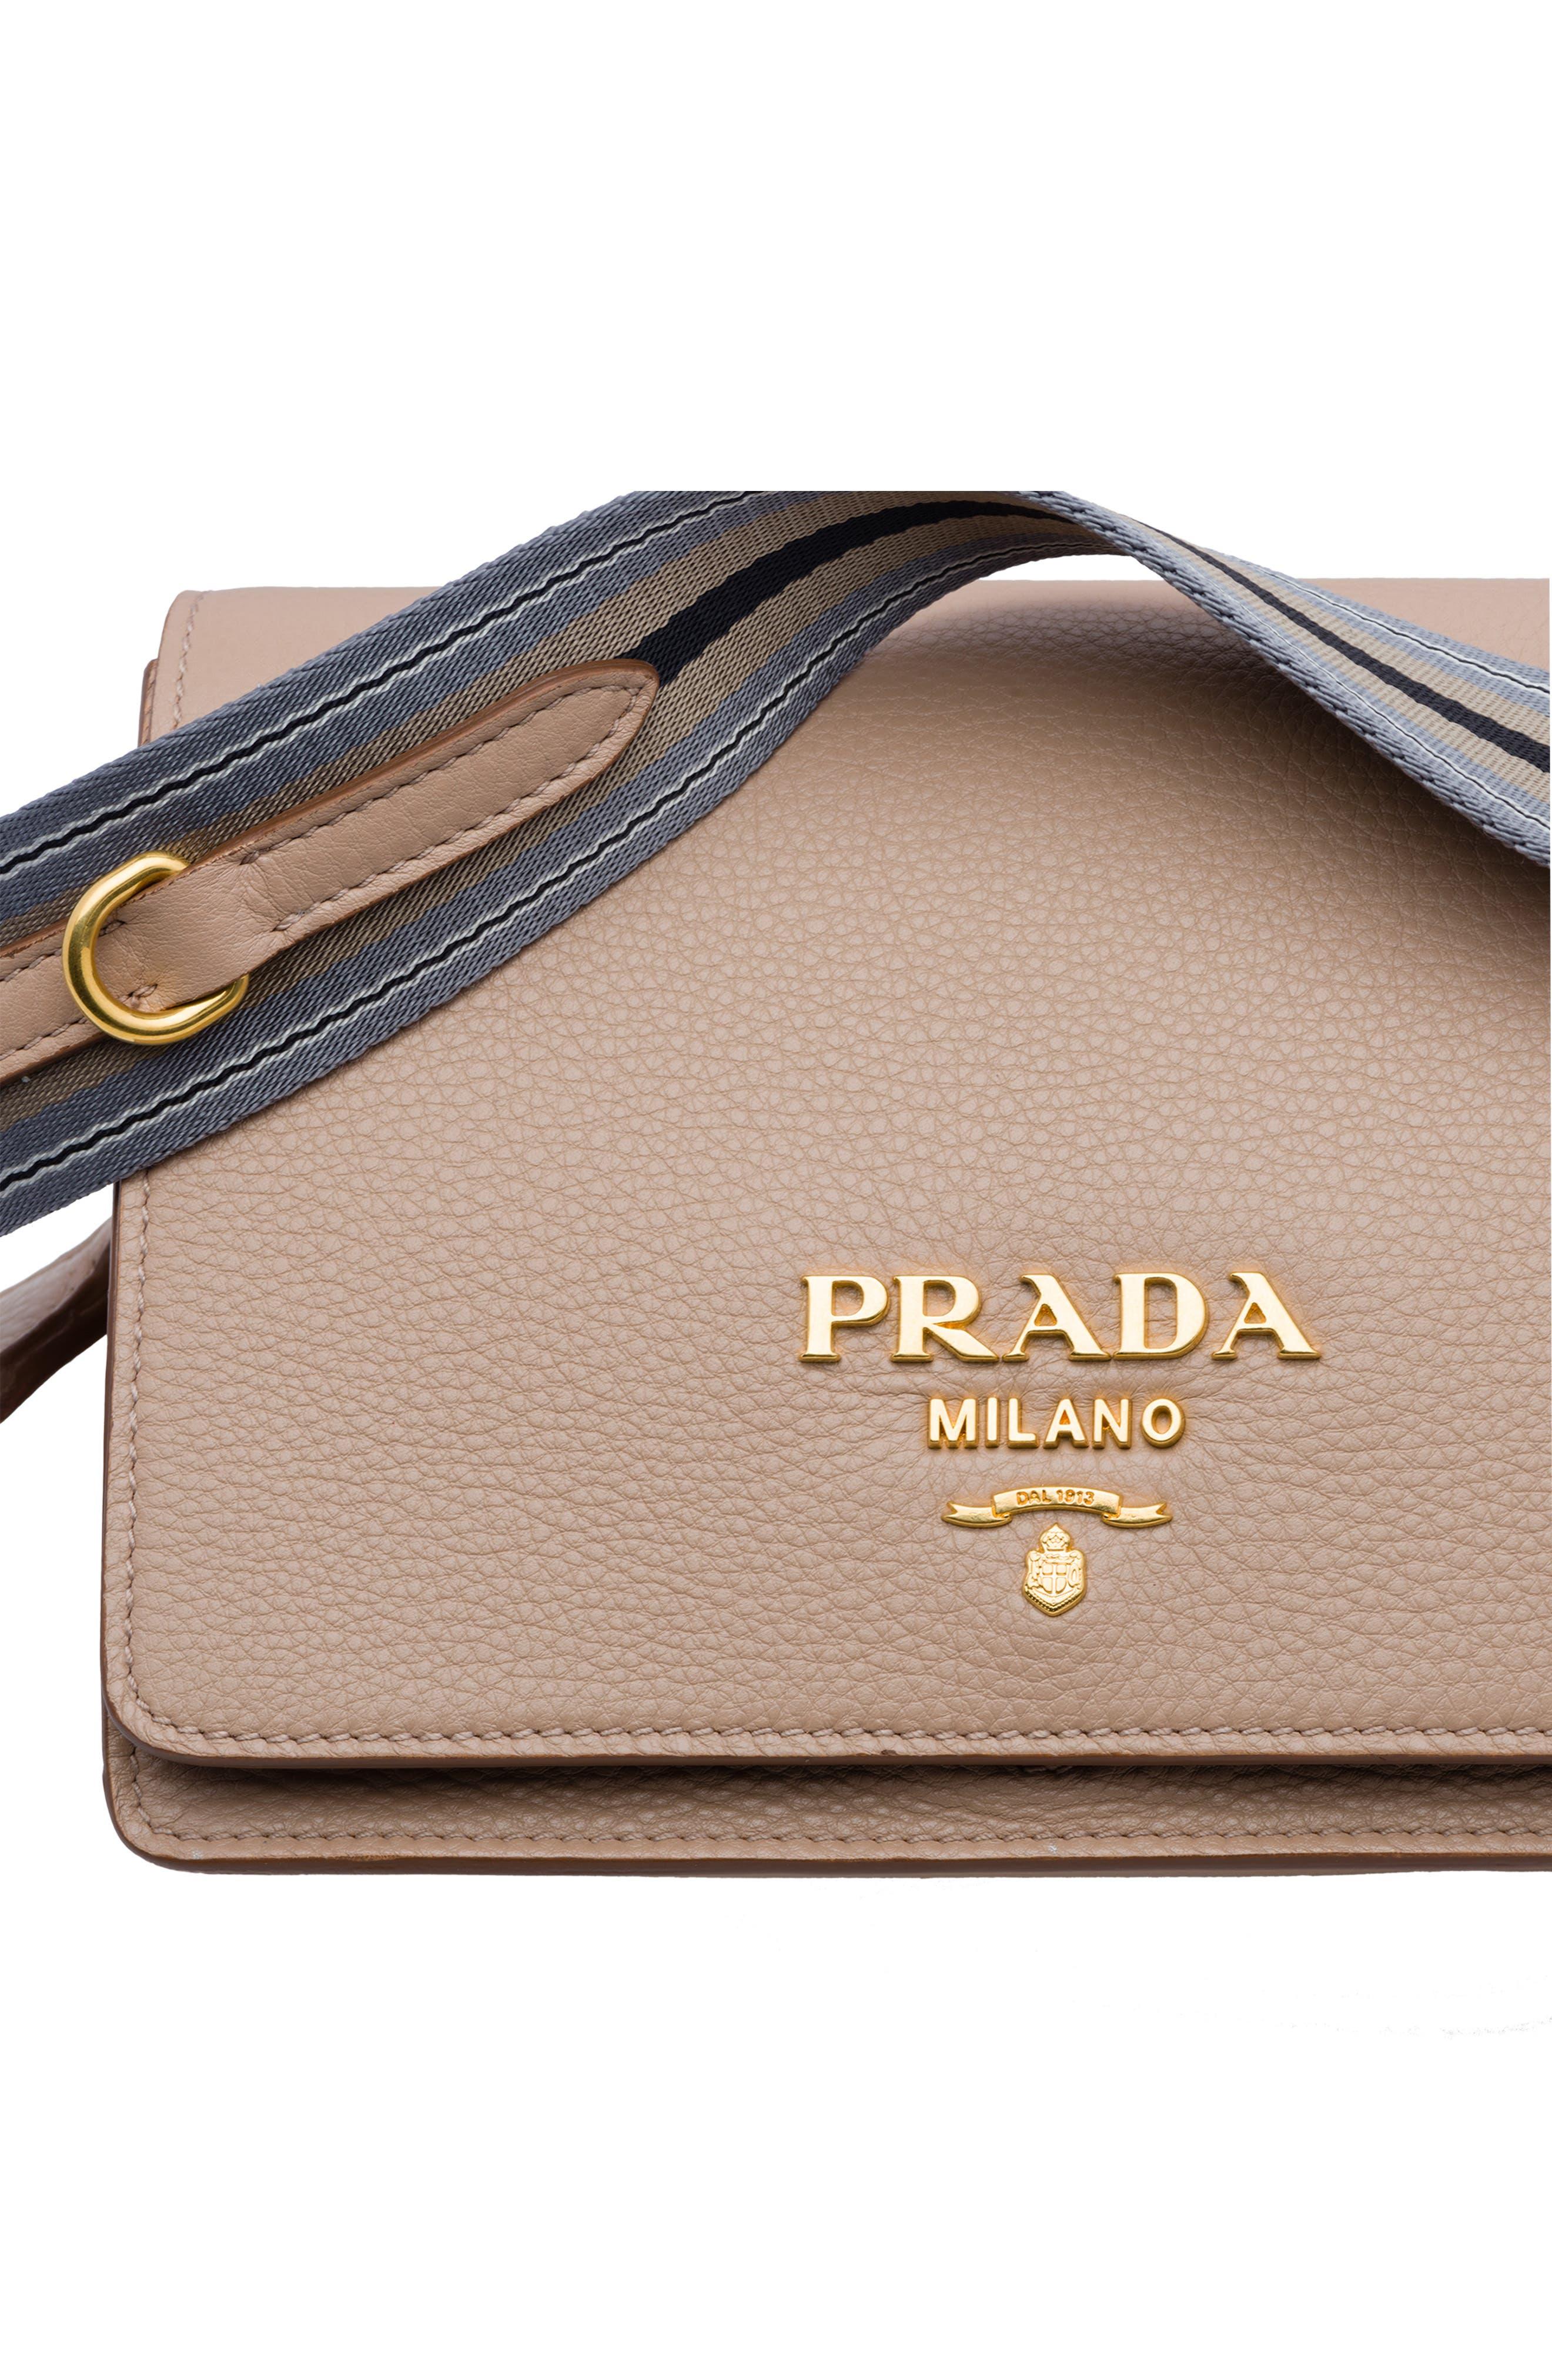 PRADA, Vitello Daino Double Compartment Leather Shoulder Bag, Alternate thumbnail 6, color, CAMMEO